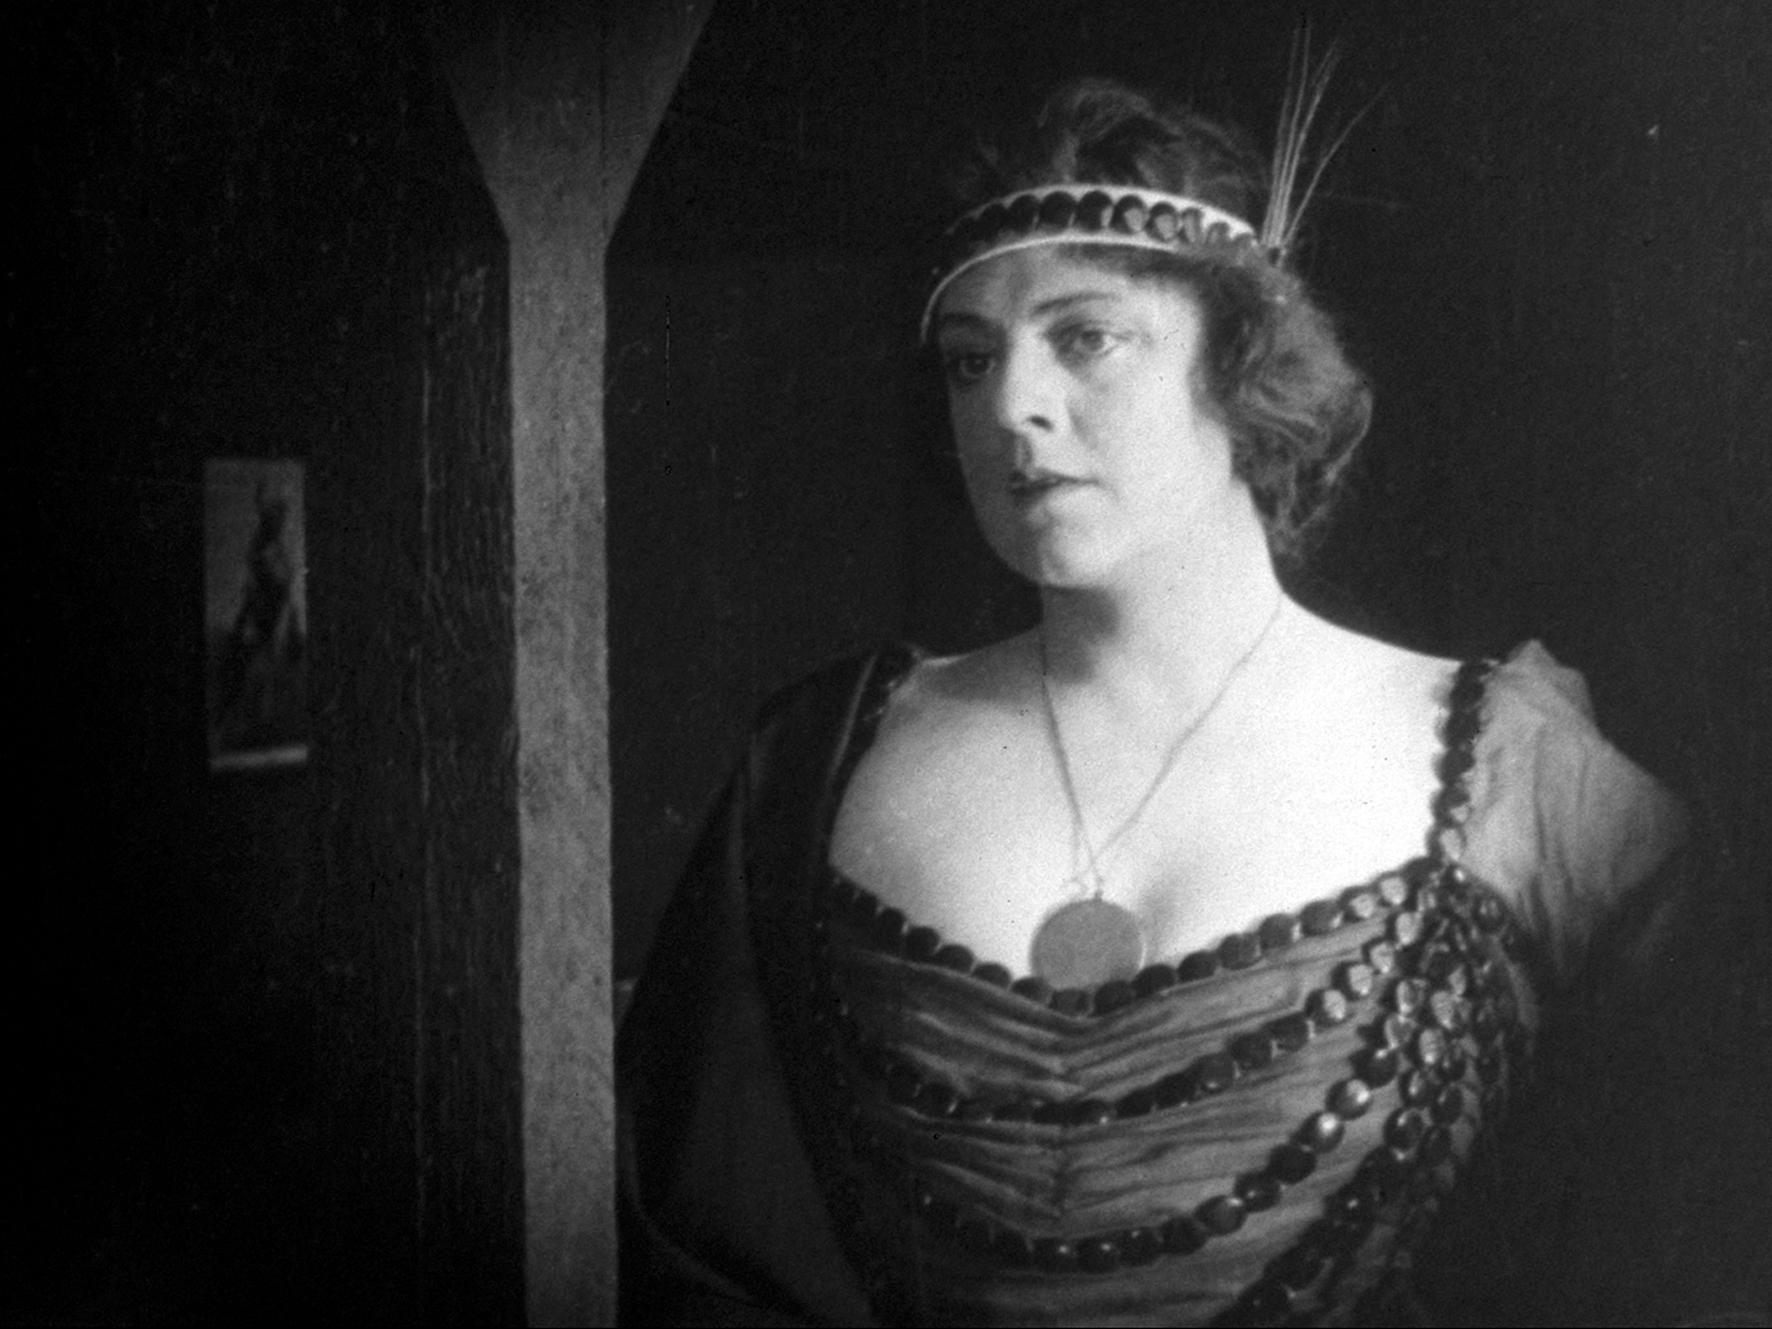 Hayley Chase,Sophie Cookson Porno archive Ian Richardson (1934?007),Will Sasso